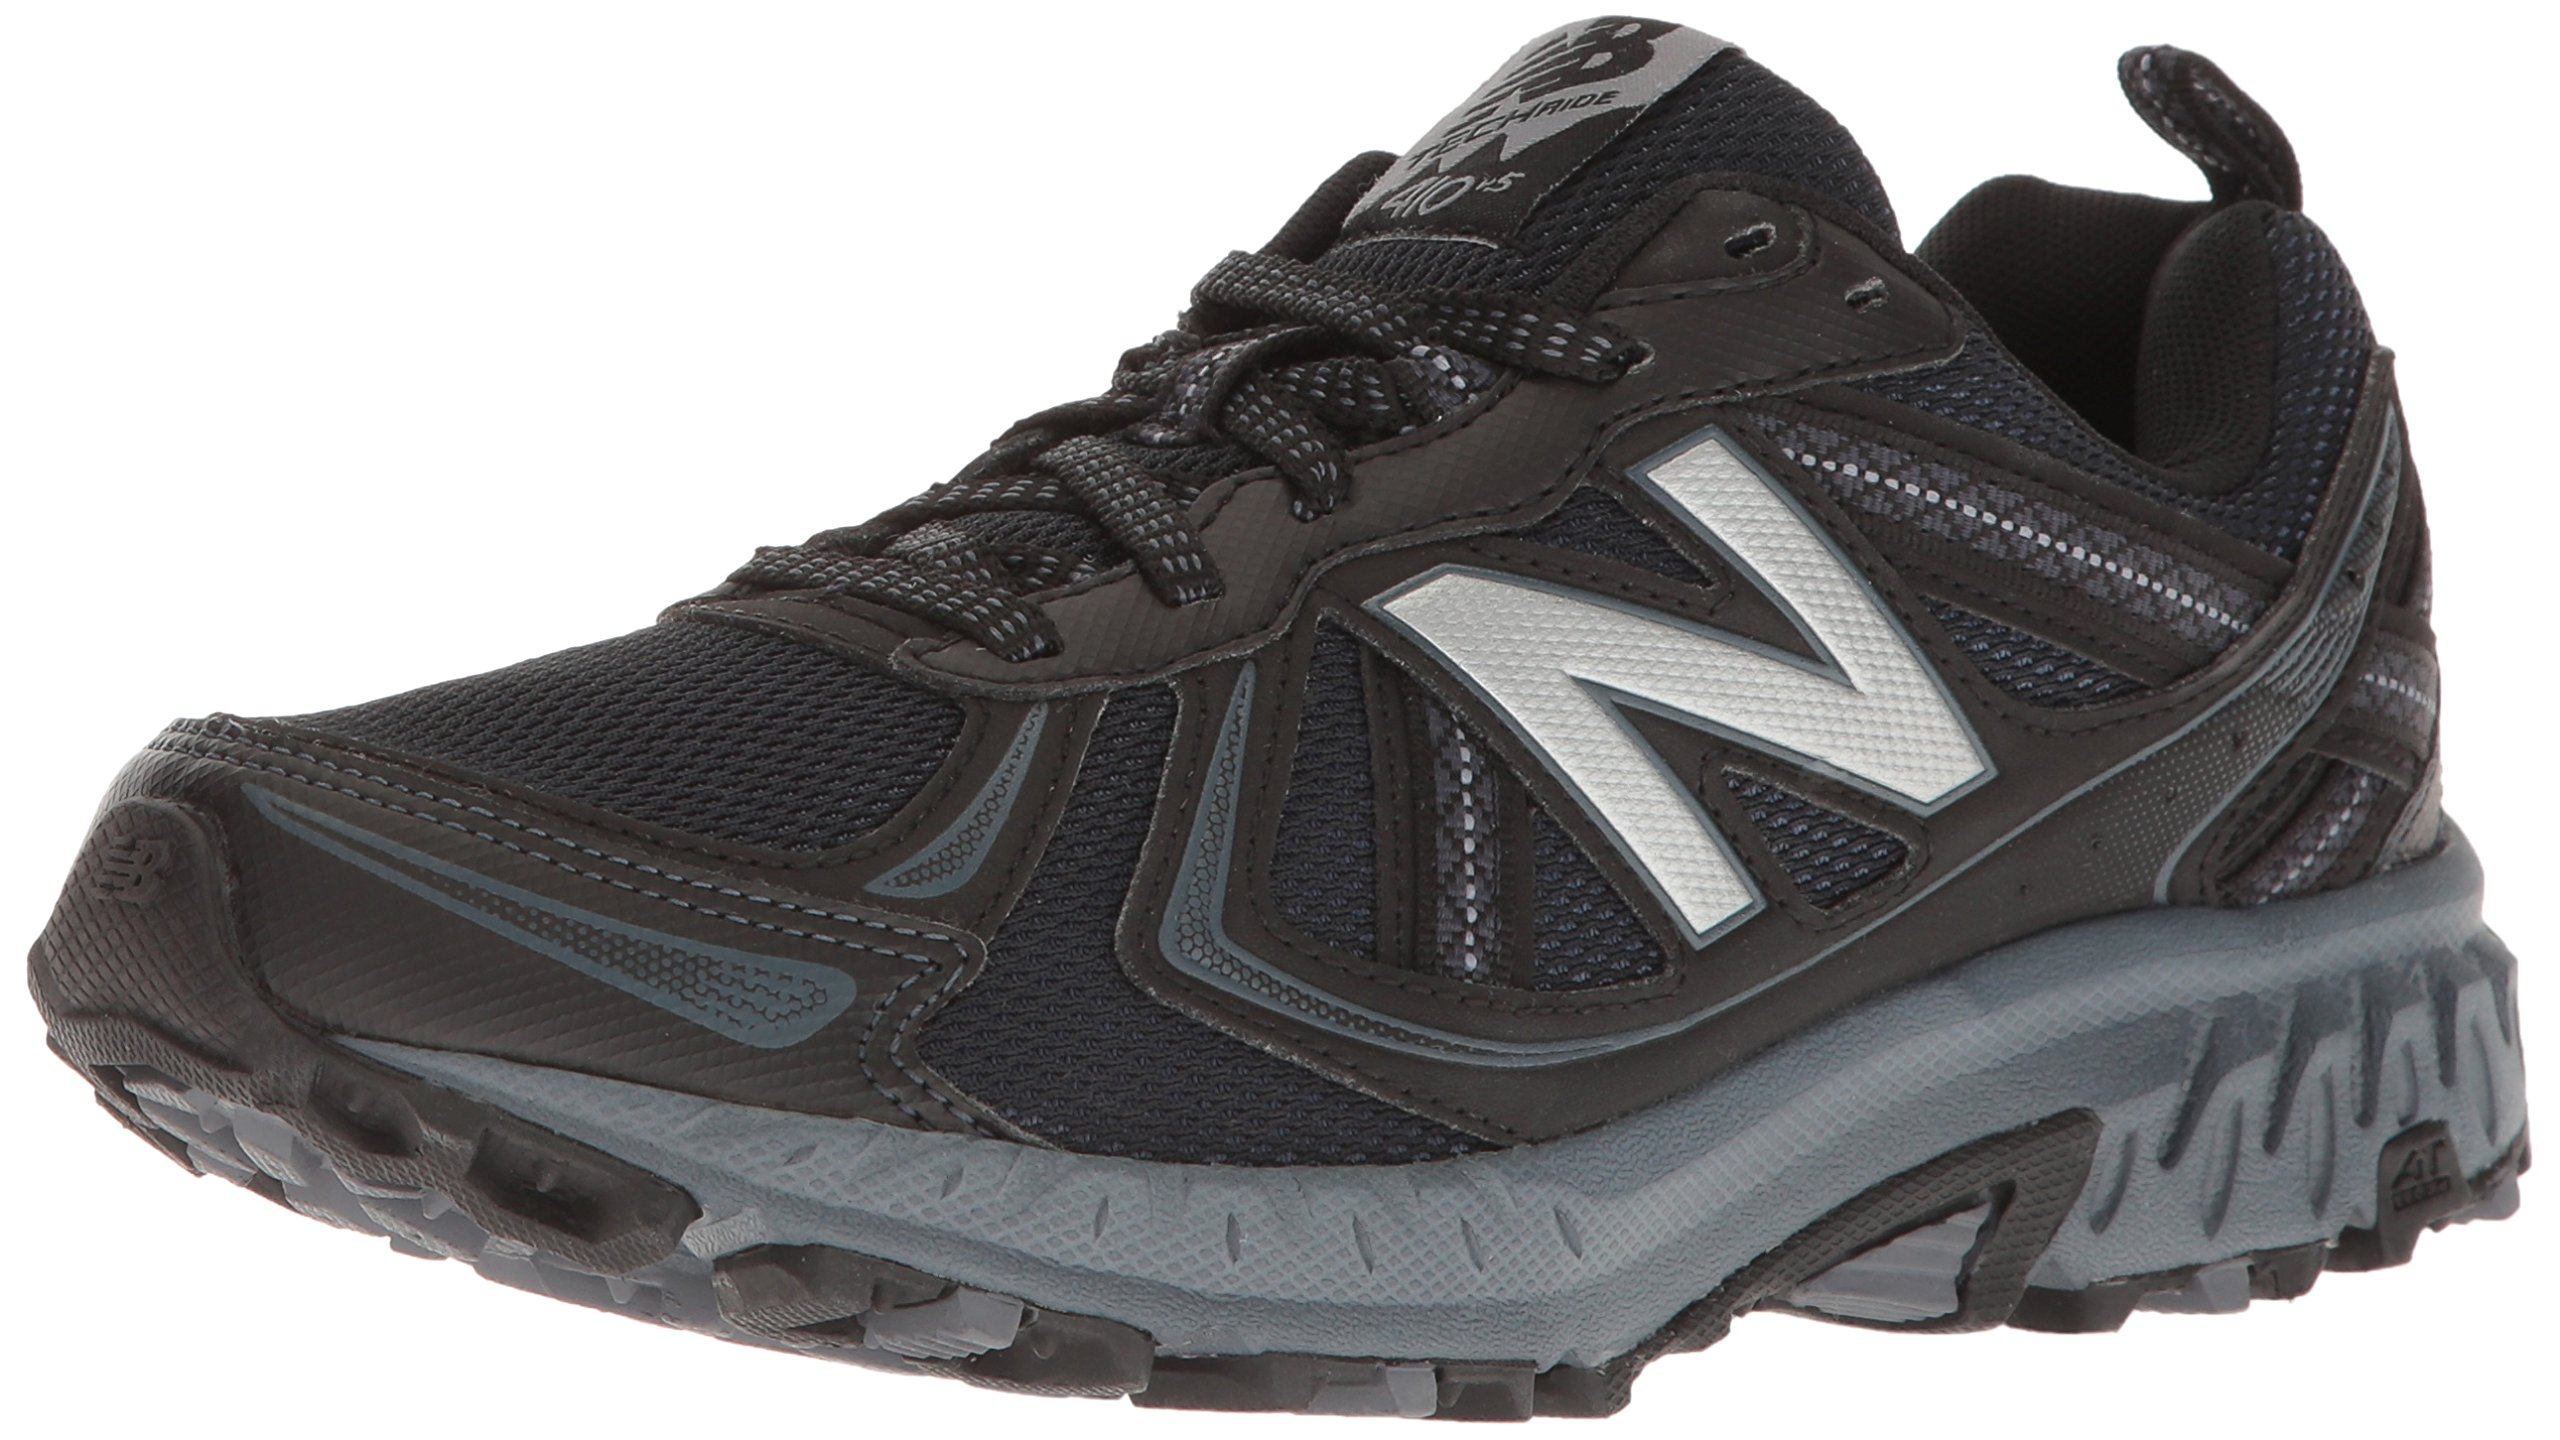 New Balance Men's MT410v5 Cushioning Trail Running Shoe, Black, 9 D US by New Balance